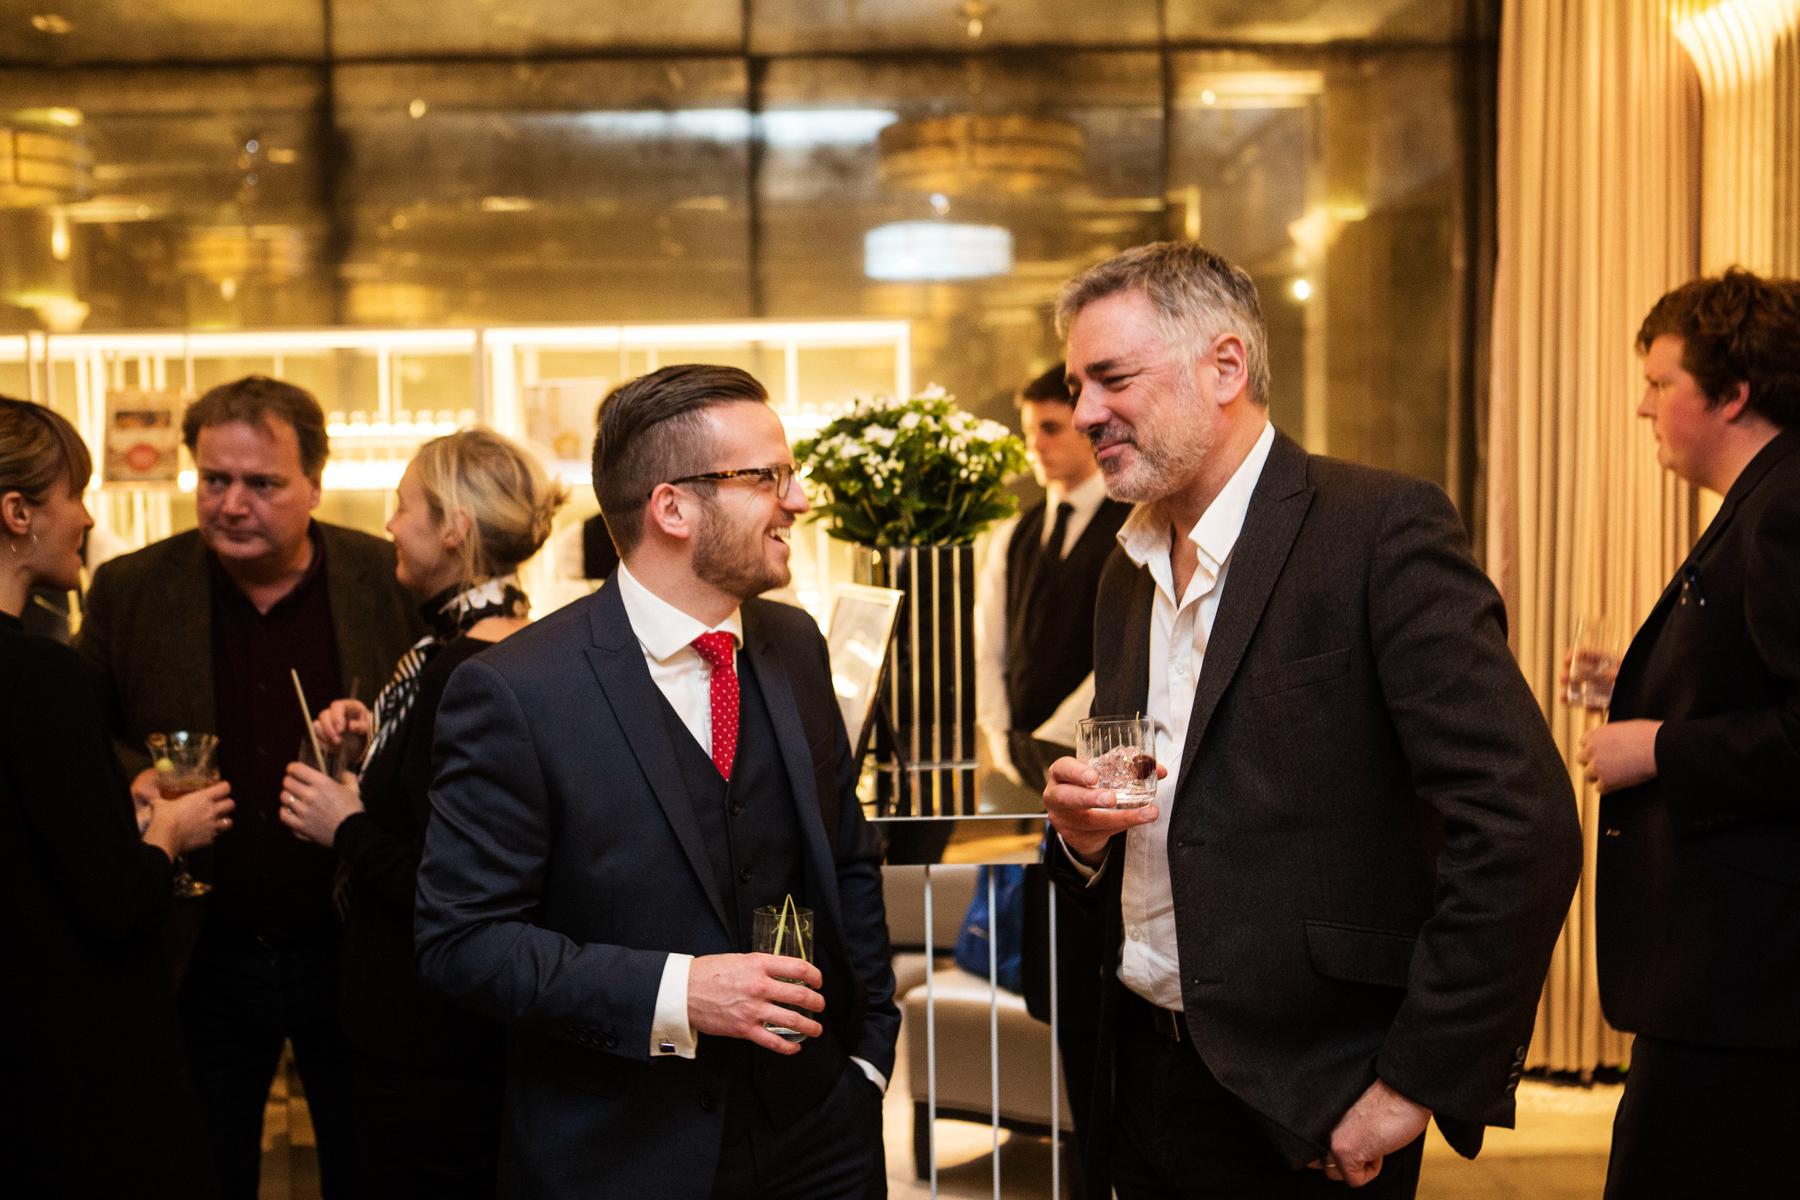 Raccoon London - Corporate Event Photographer - Andreas - May 2018  42.jpg